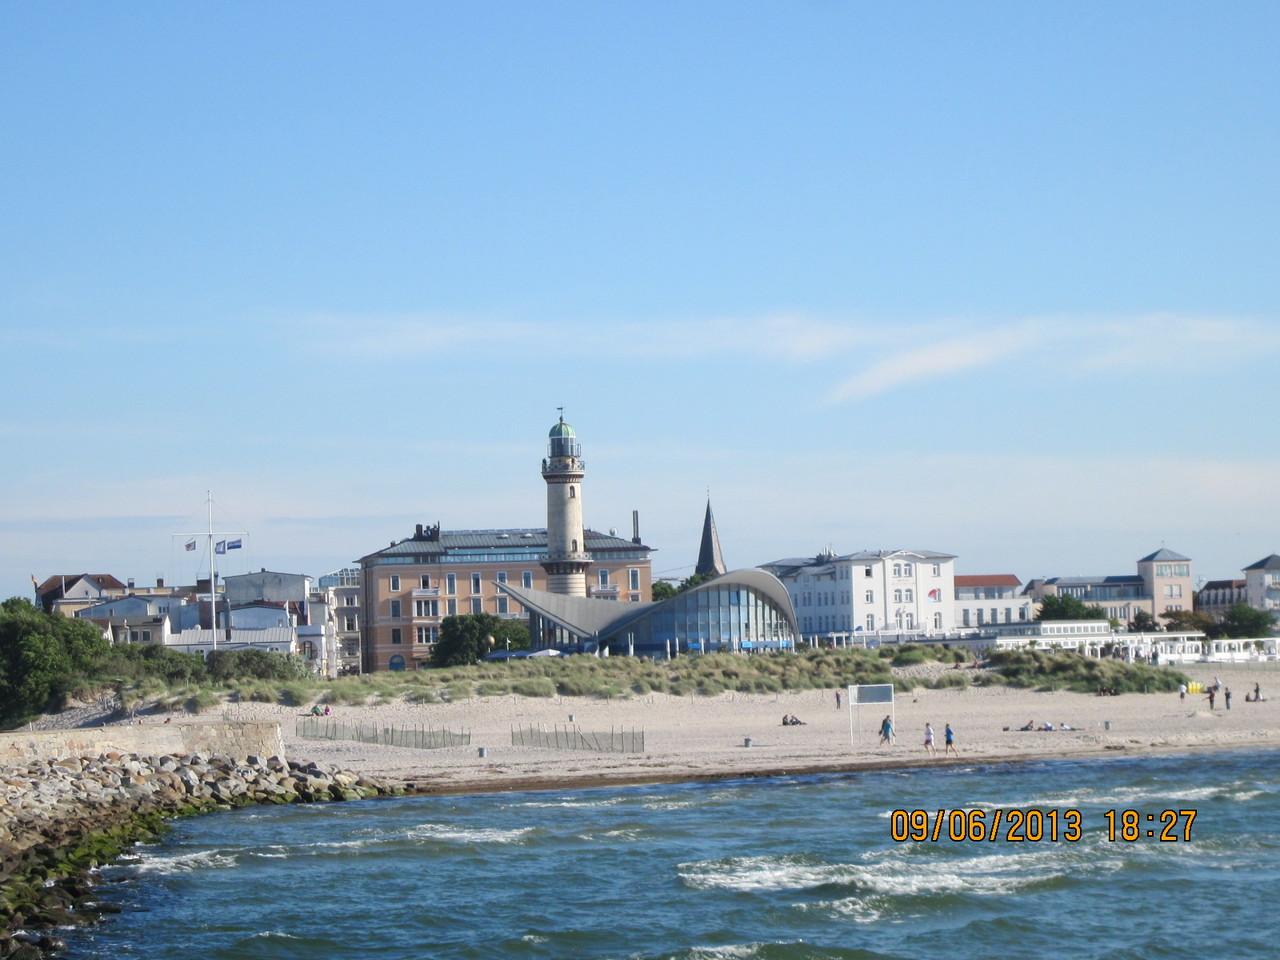 Blick zum Strand und Teepott